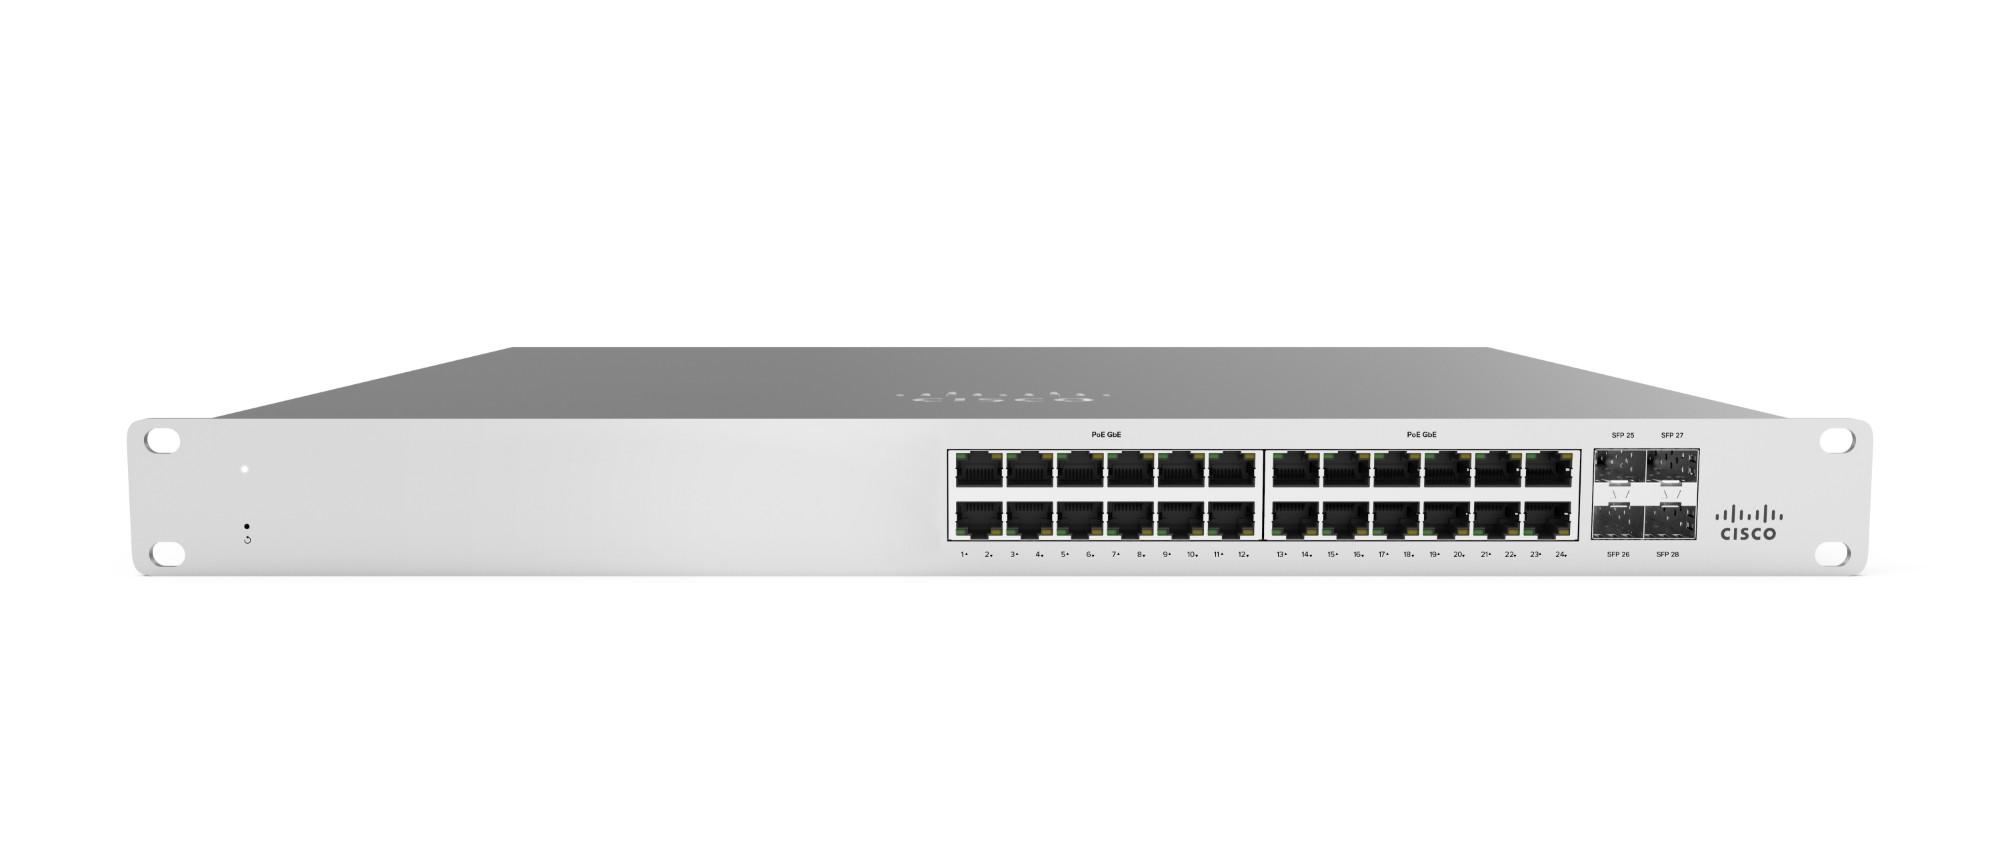 Cisco Meraki MS120-24P Gestionado L2 Gigabit Ethernet (10/100/1000) Gris 1U Energía sobre Ethernet (PoE)